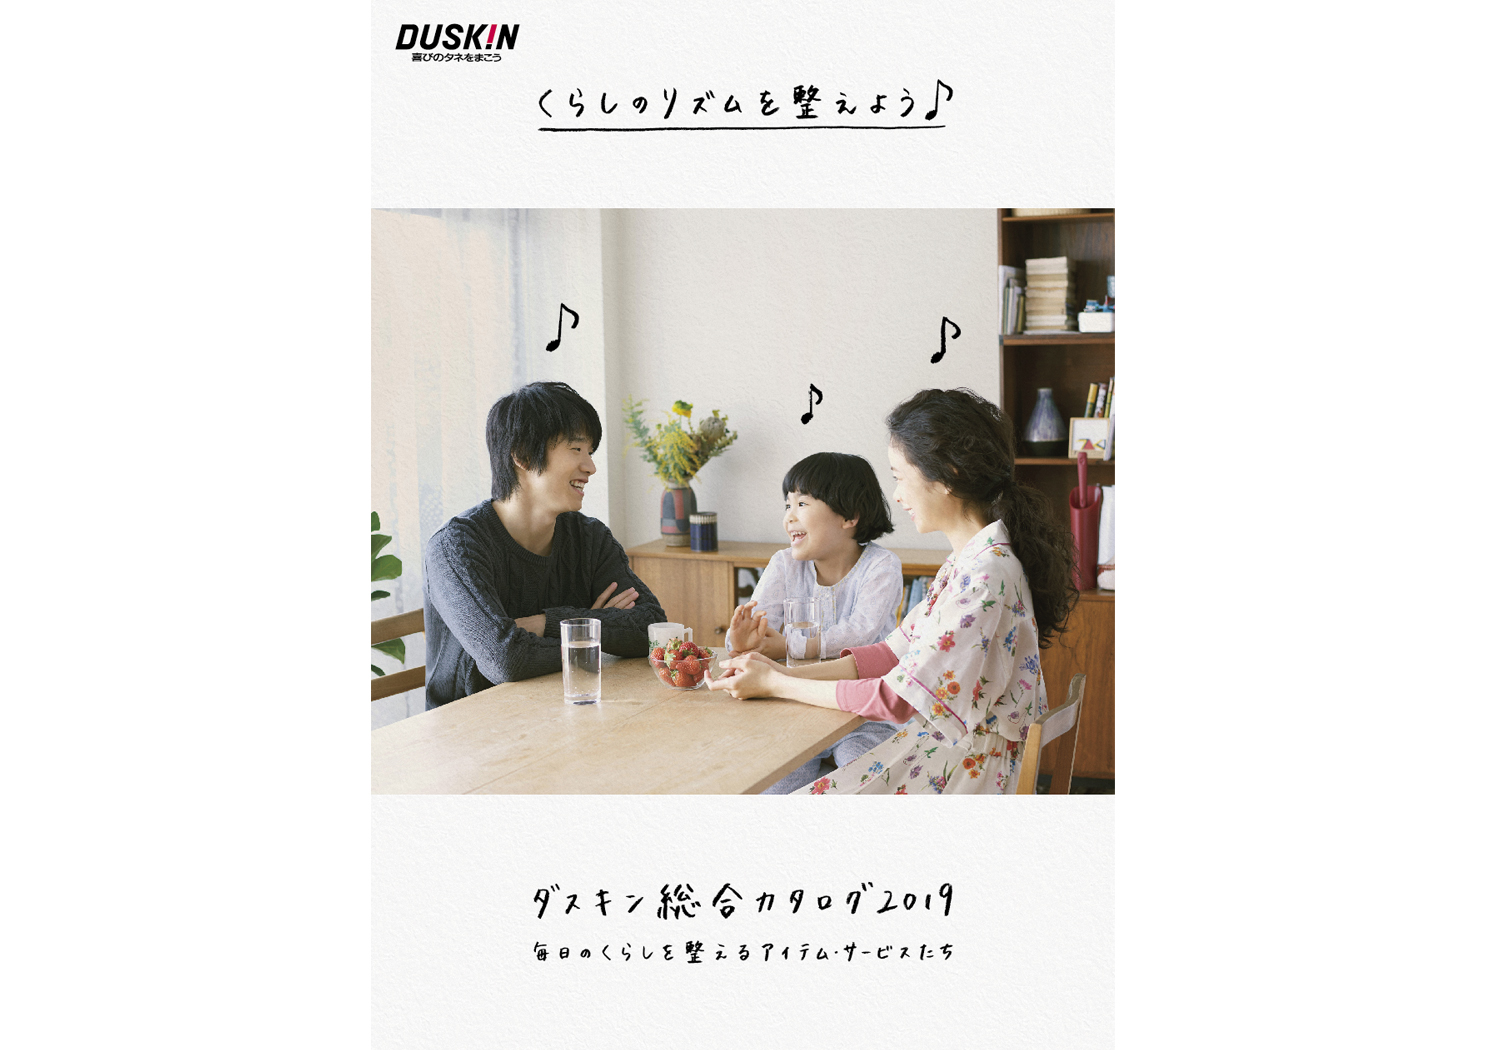 DUSKIN catalogue